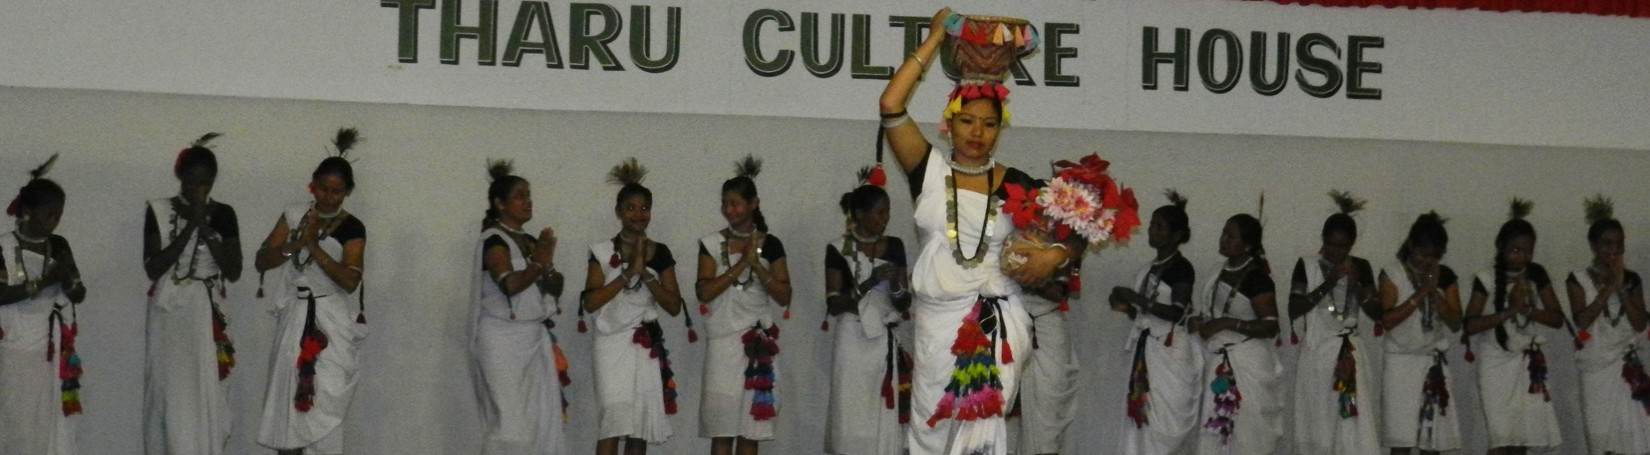 Tharu Cultural Dance show